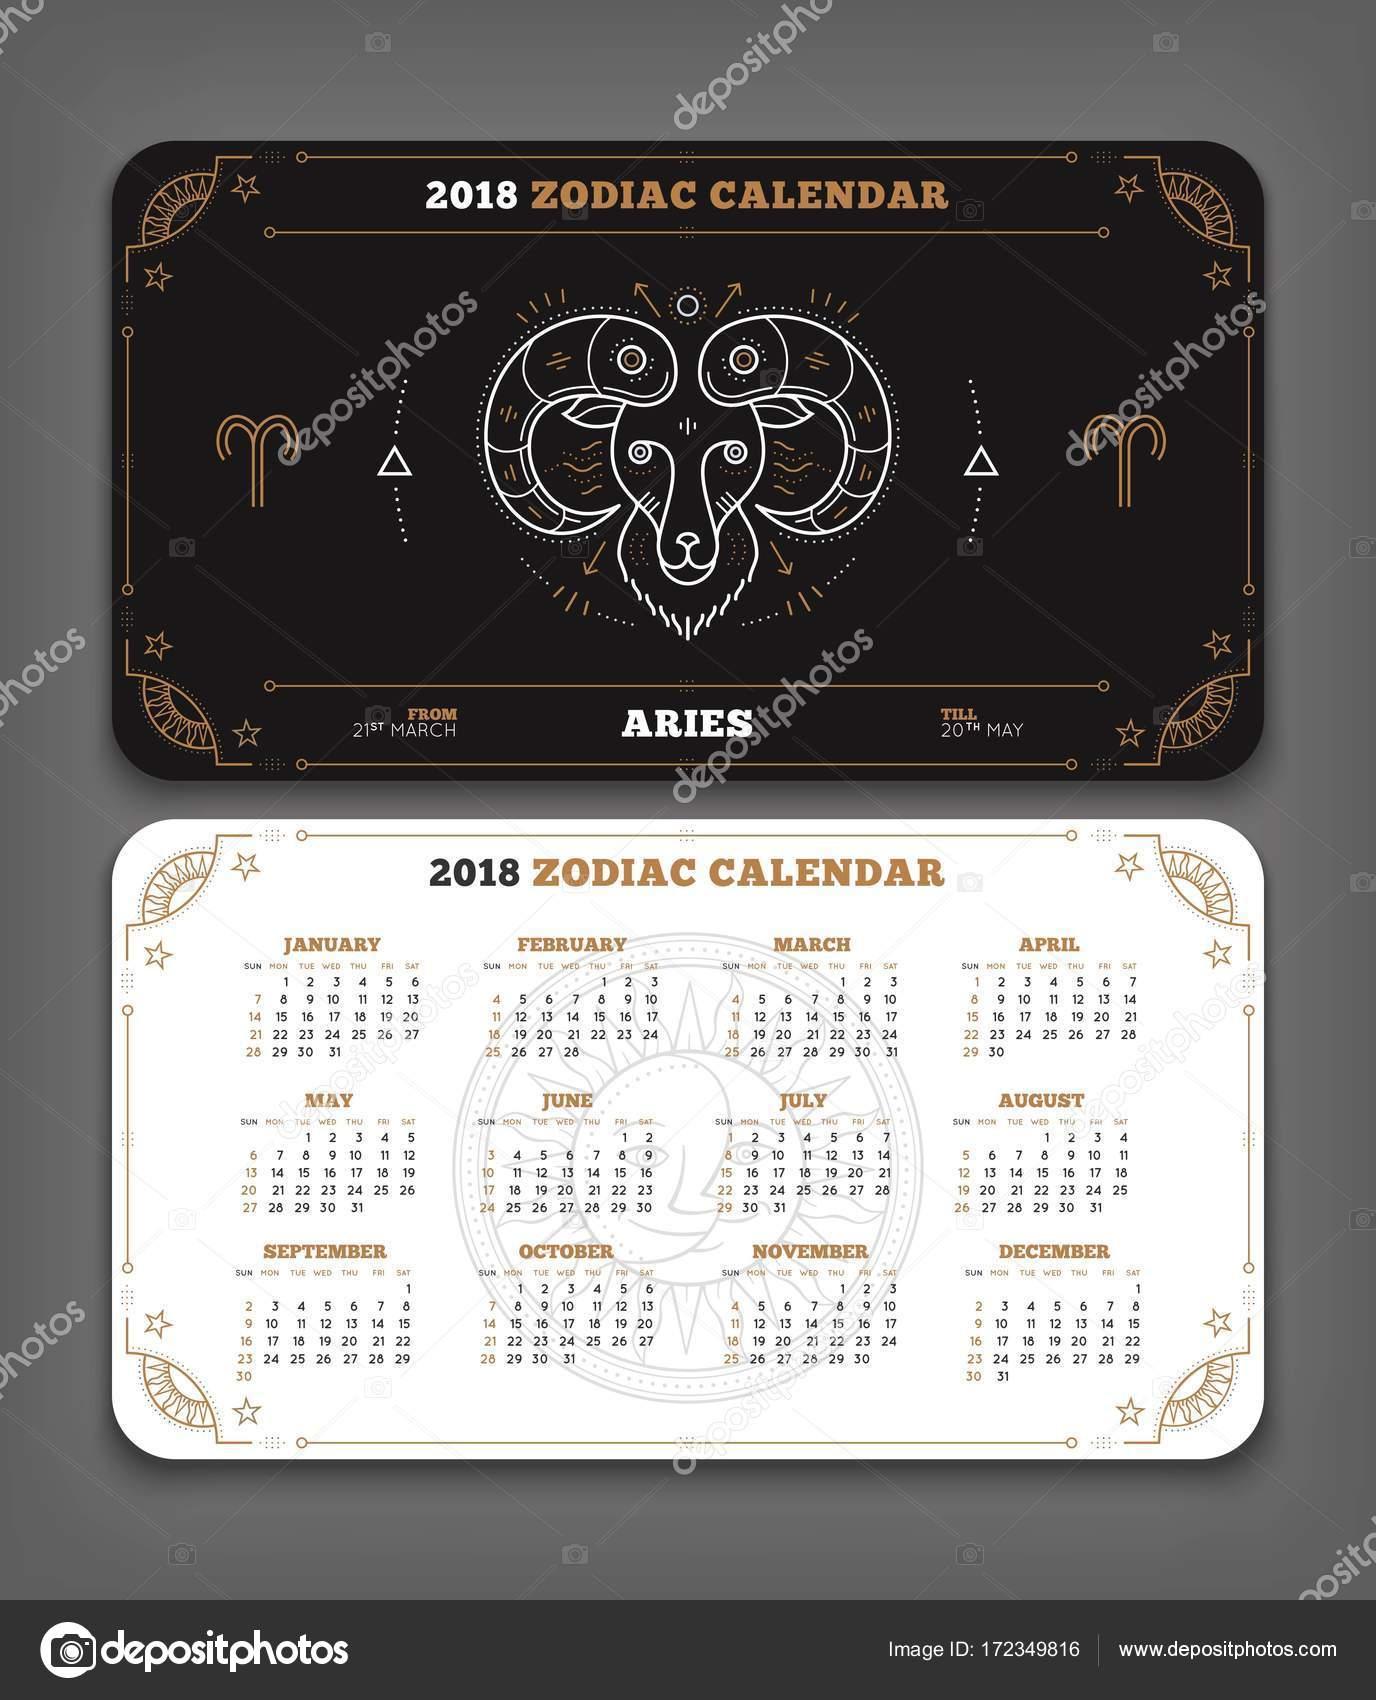 Aries 2018 year zodiac calendar pocket size horizontal